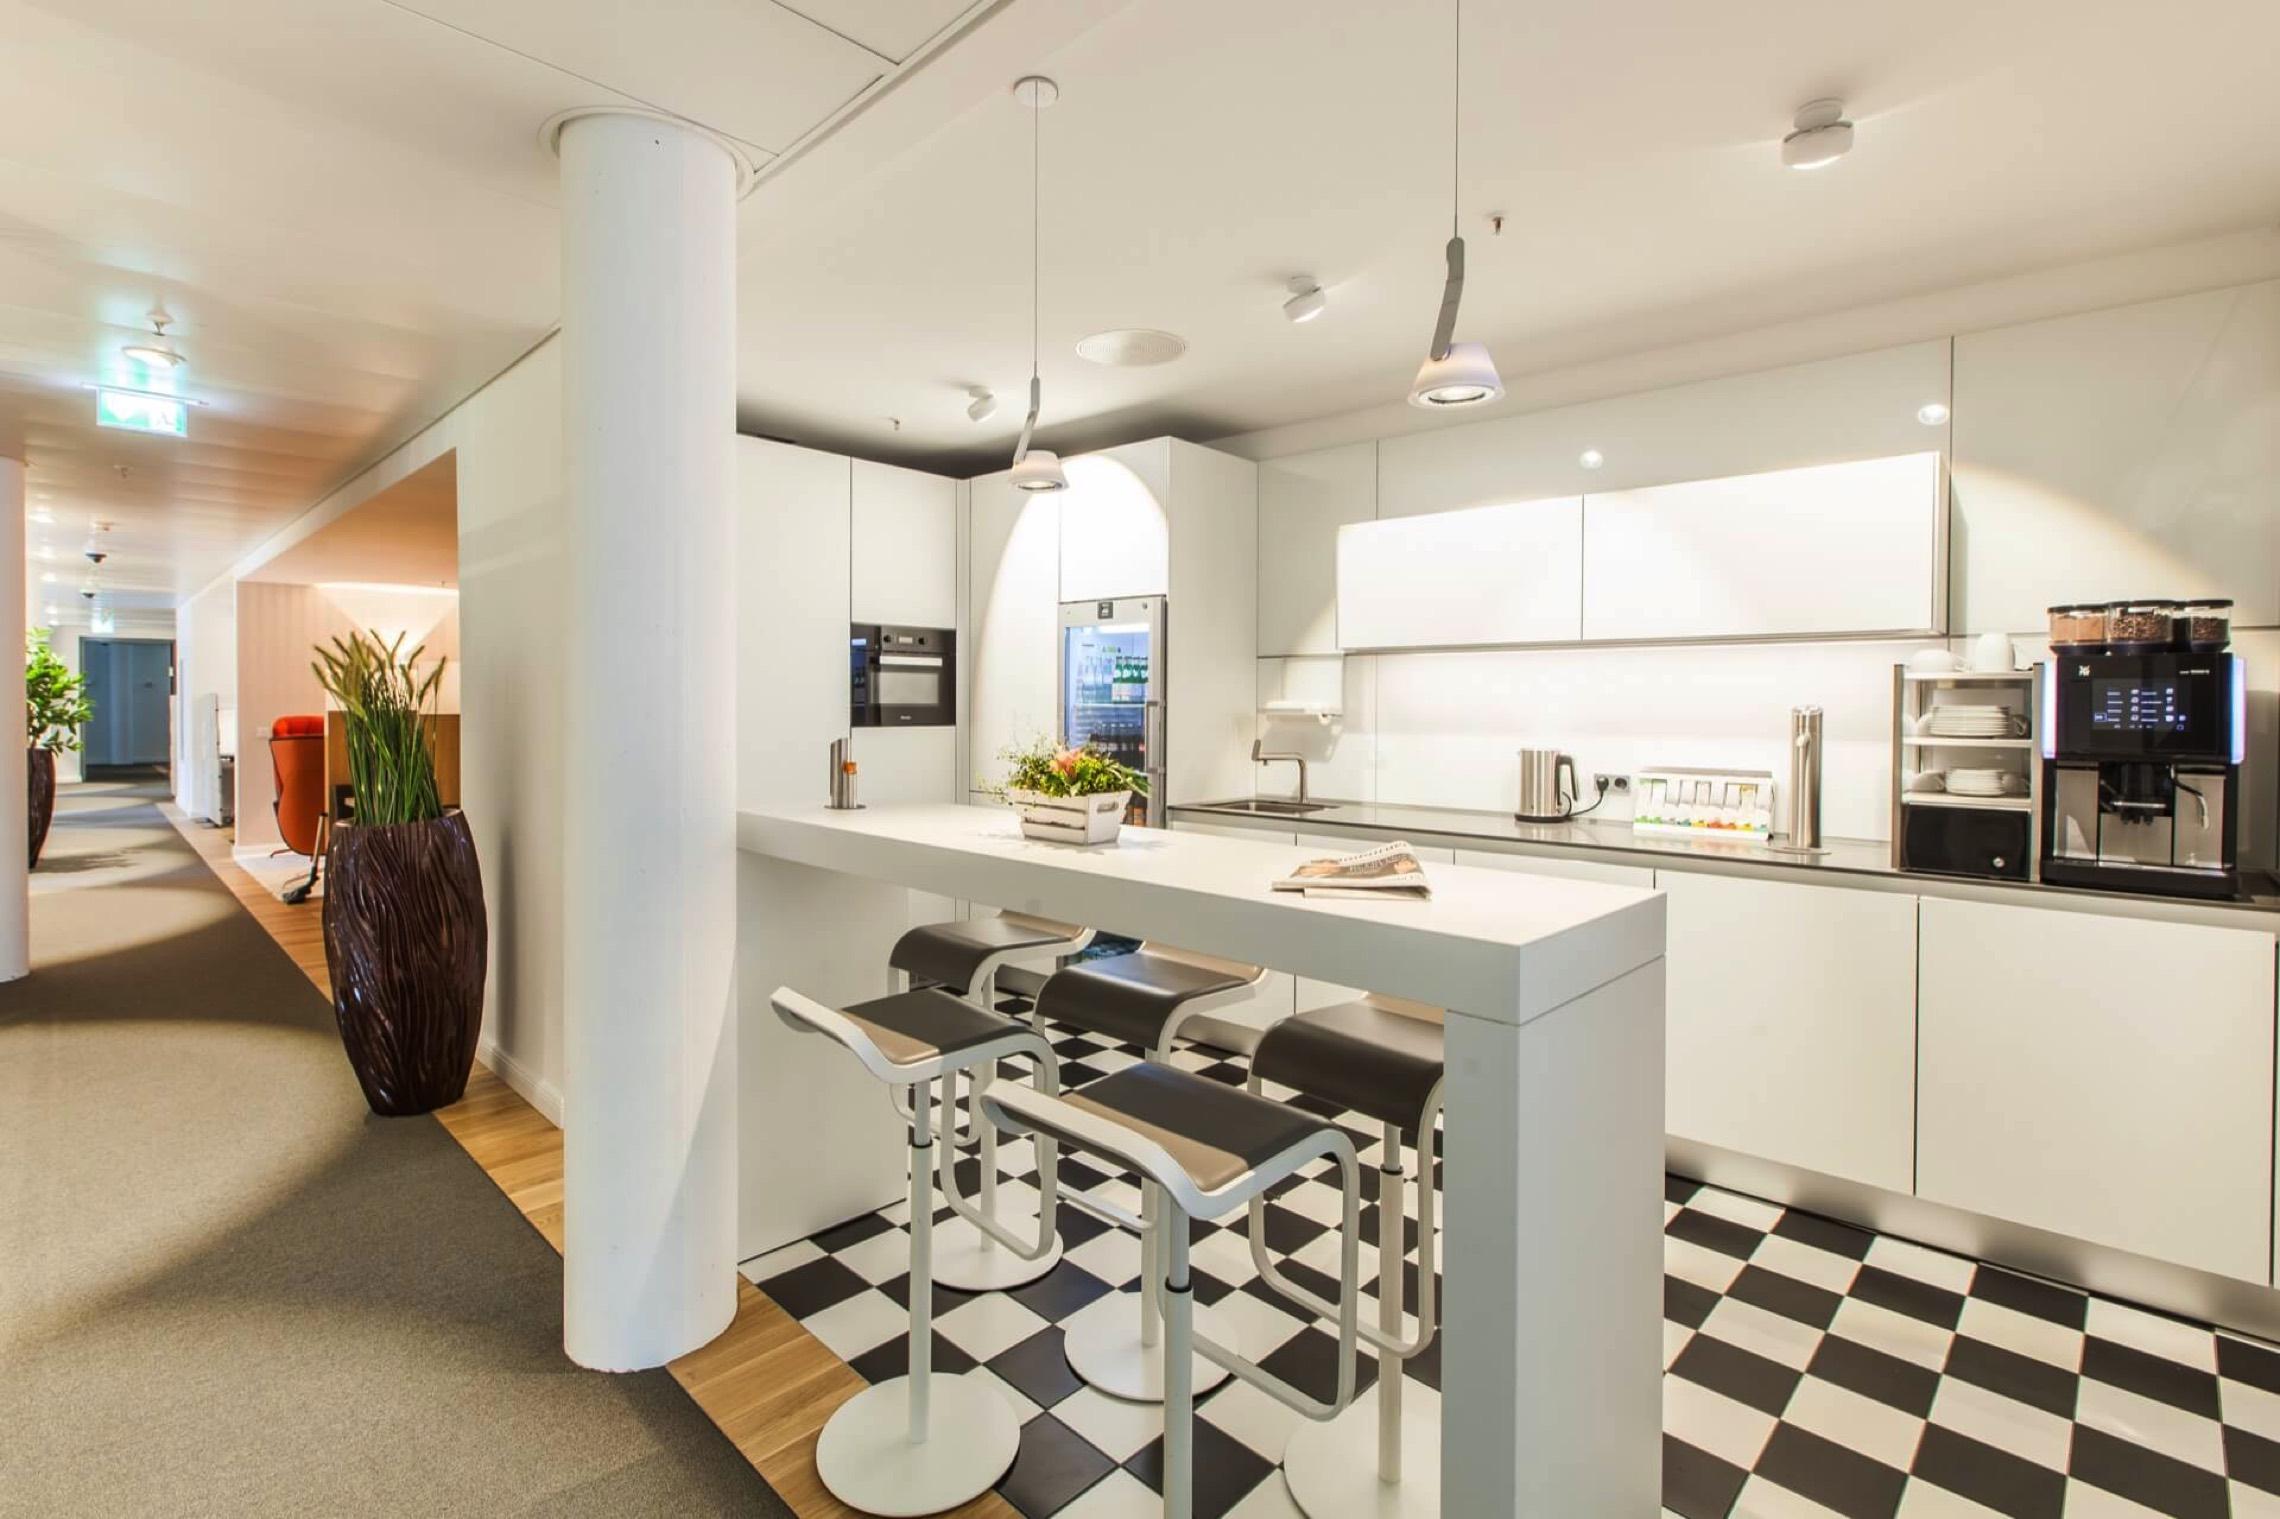 Europakontor Hamburg Kuche 1 Office Inspiration